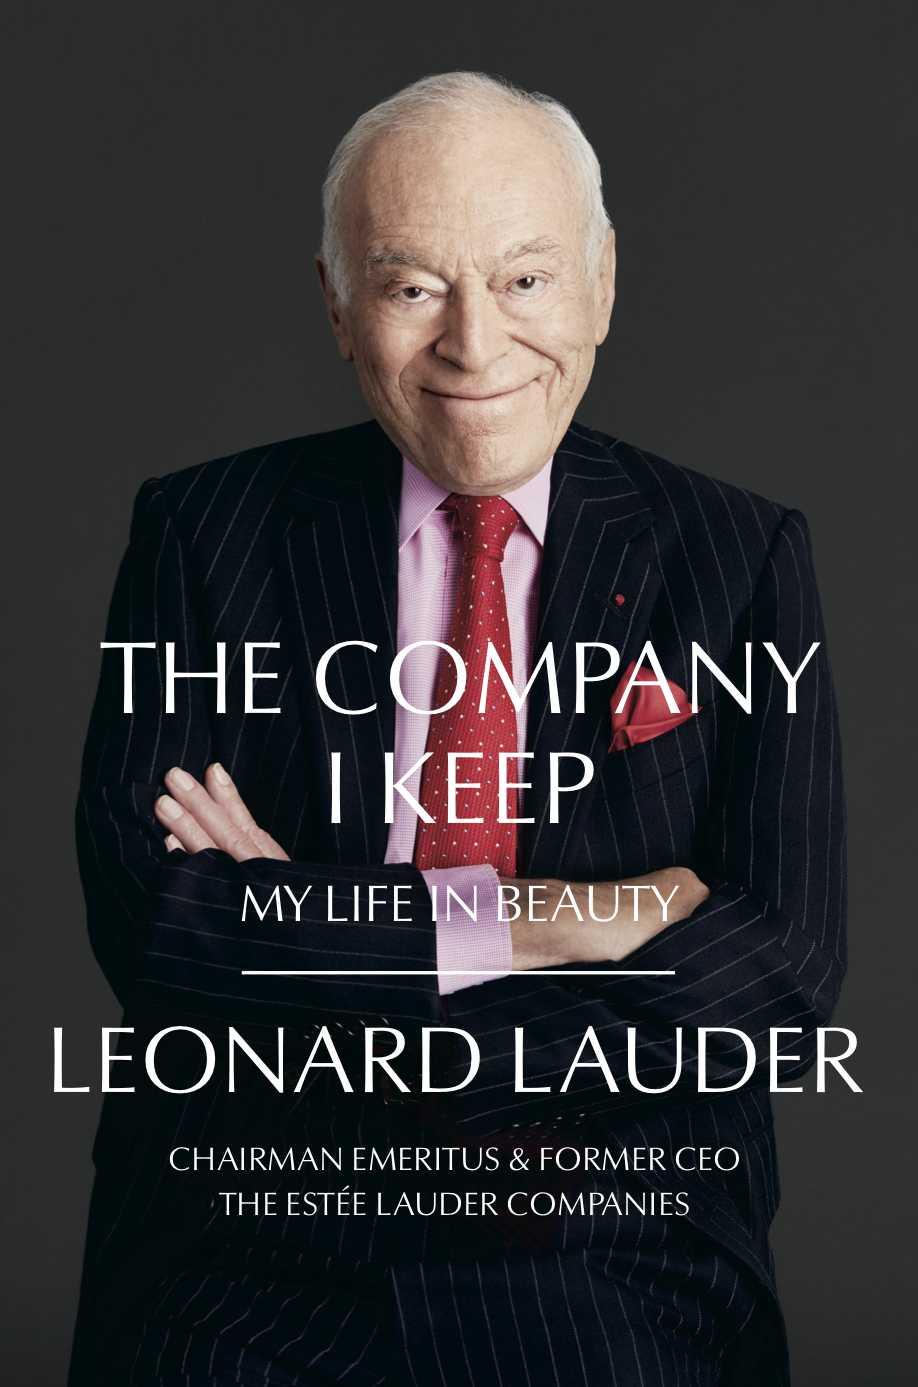 LIFE LESSONS: LEONARD LAUDER